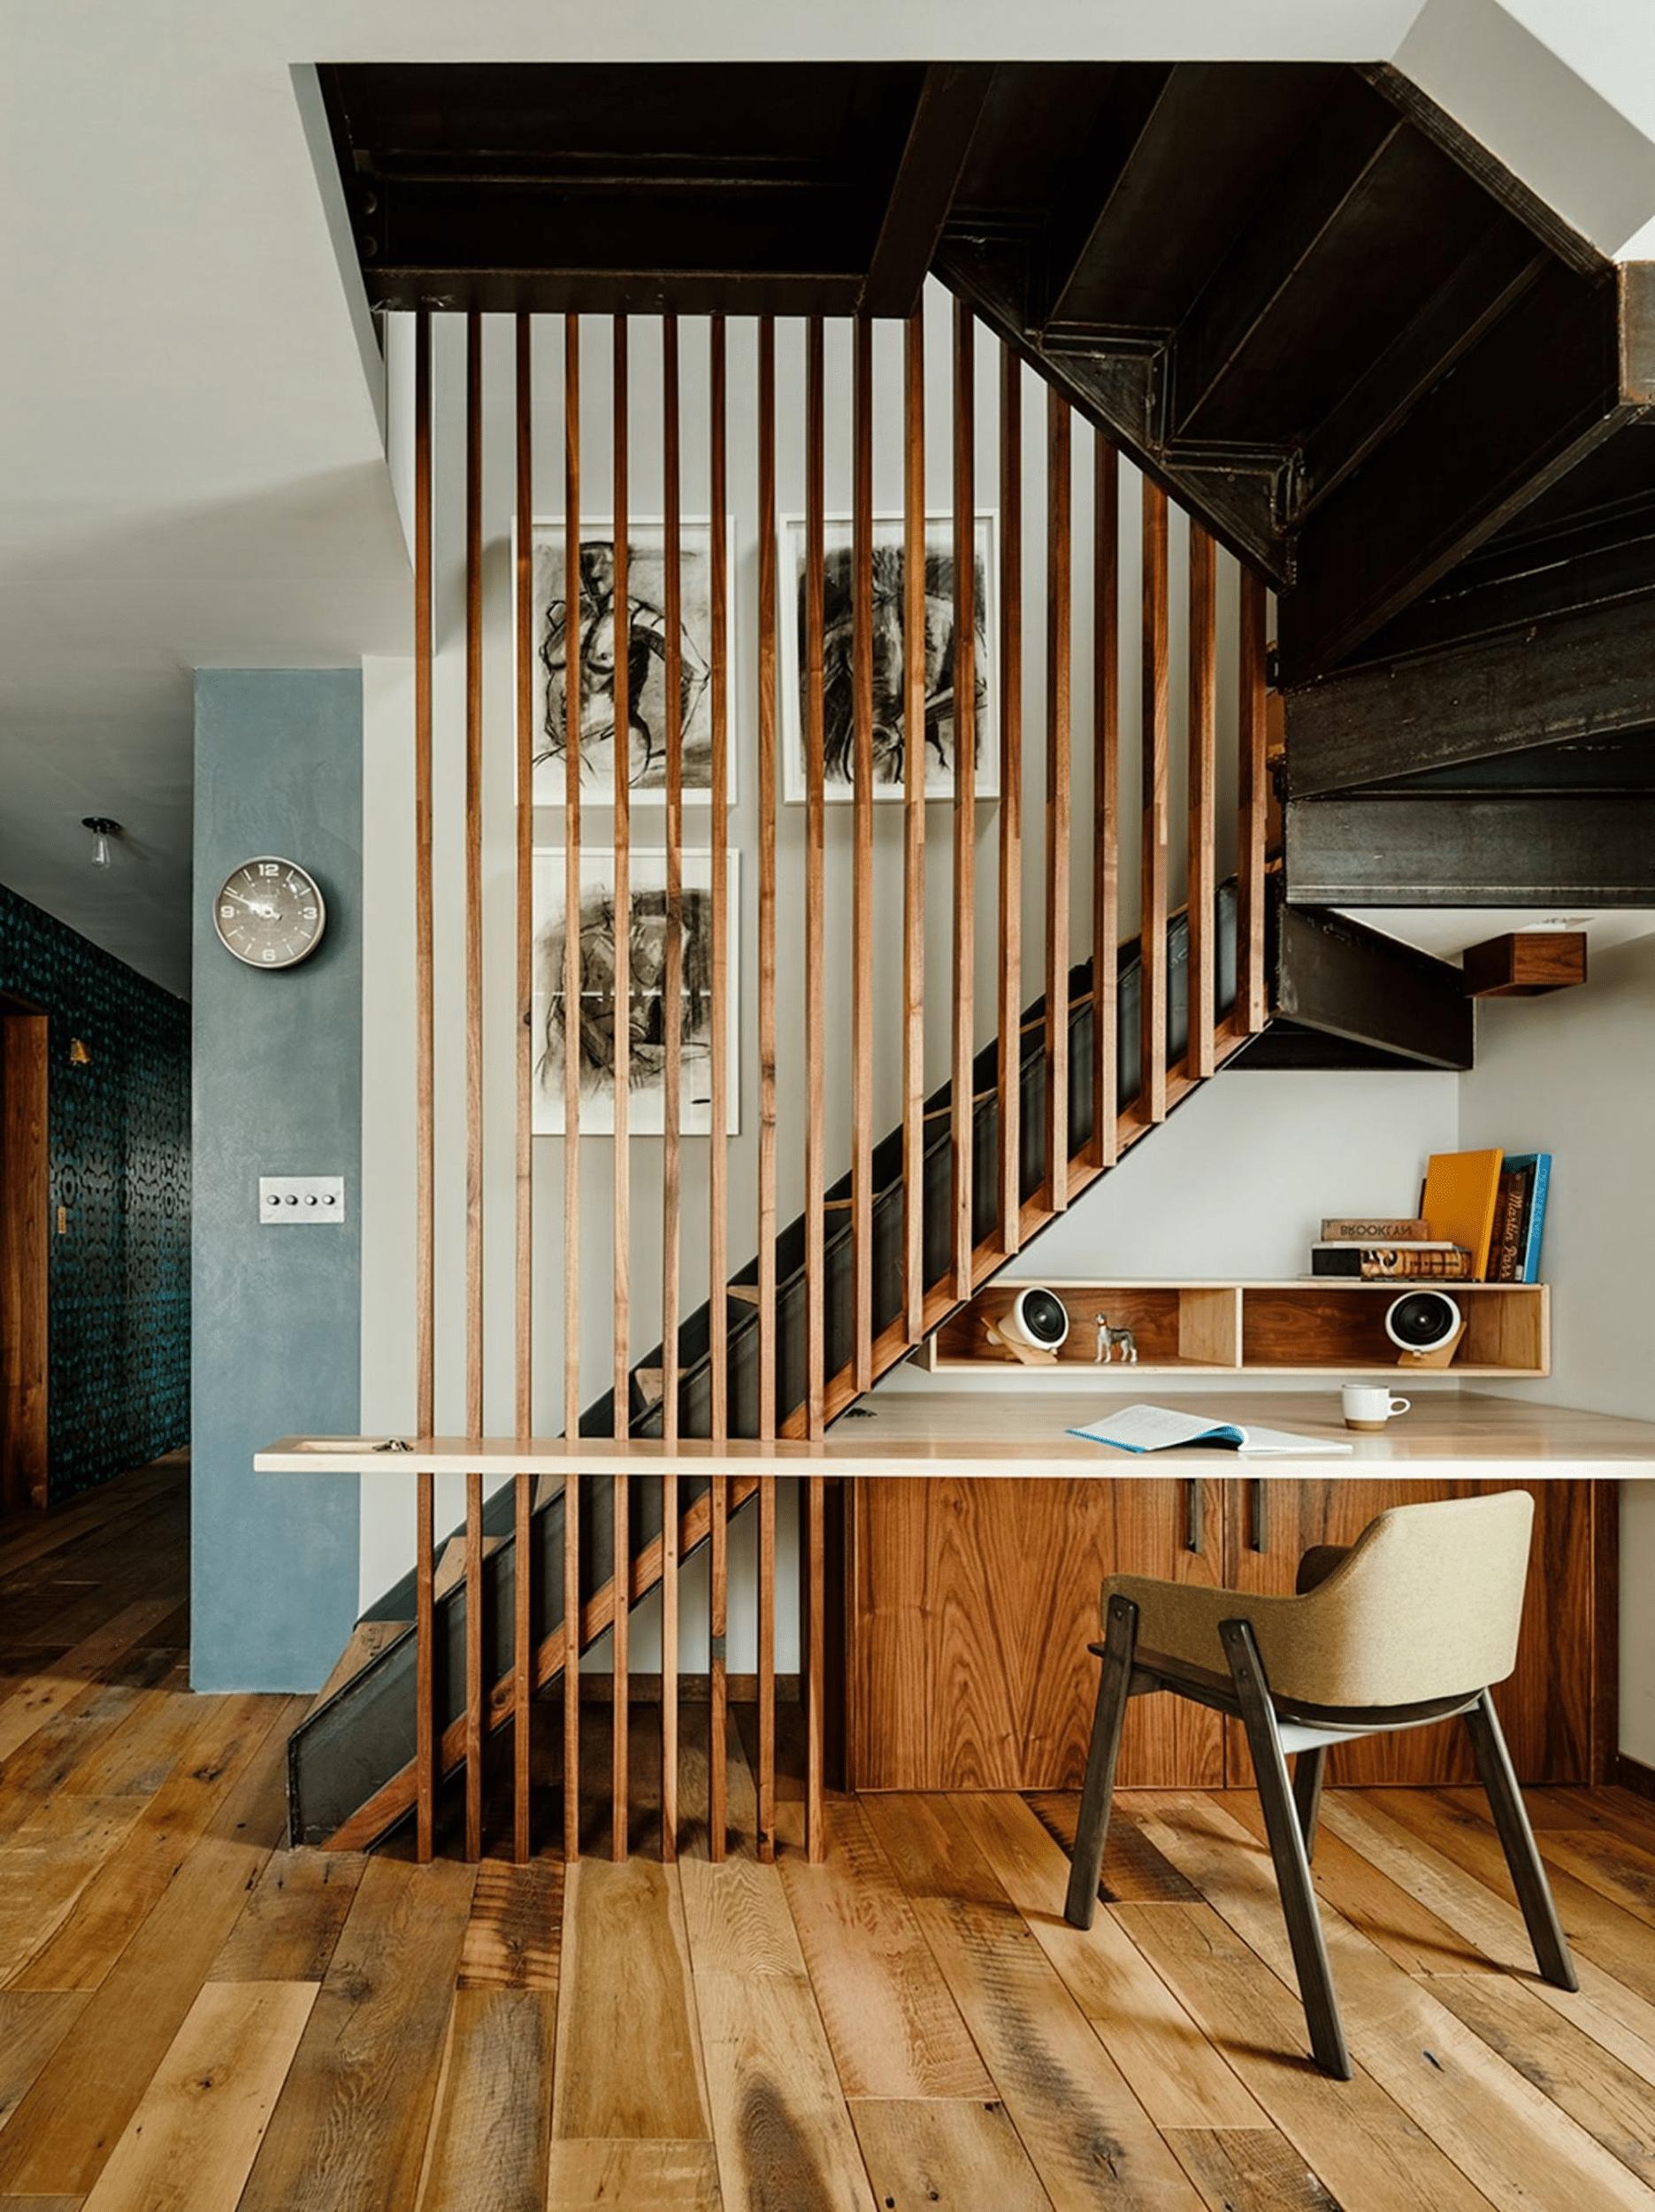 Lam gỗ thanh dọc